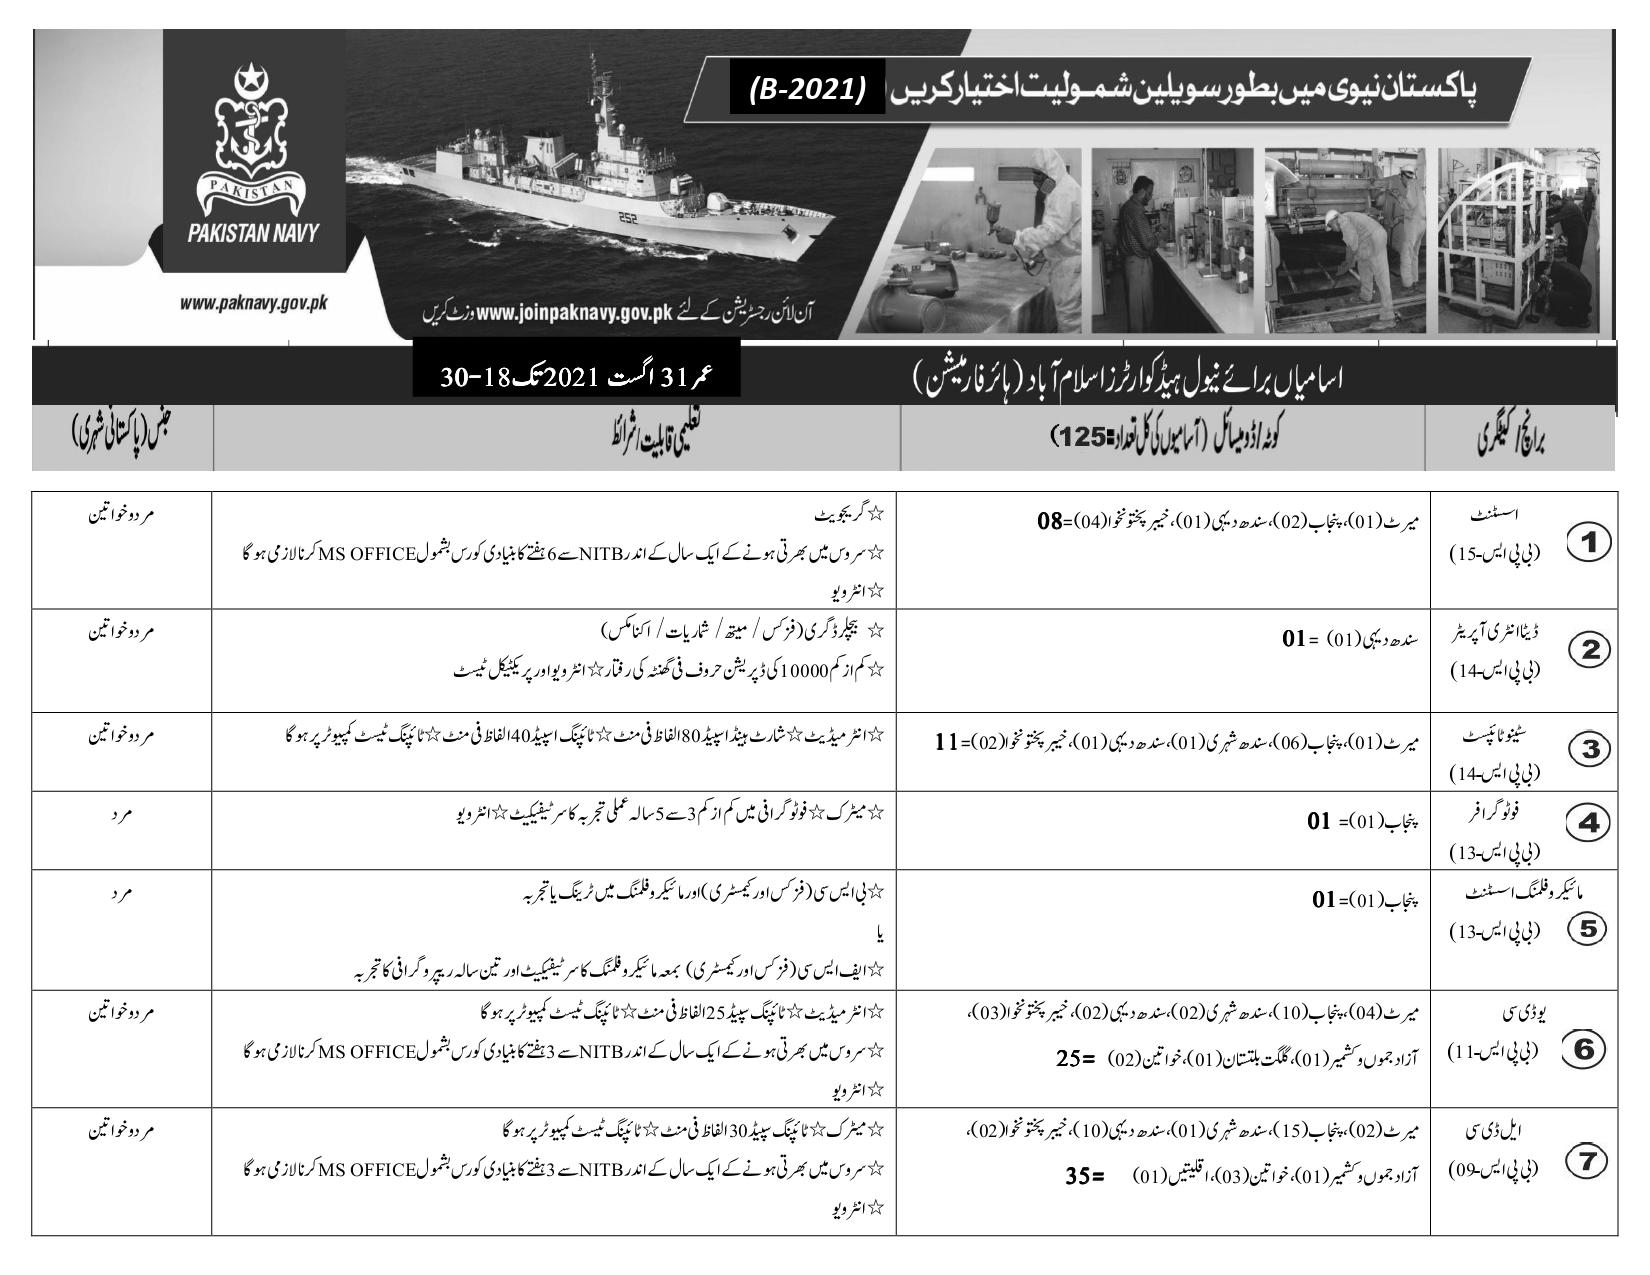 Join Pakistan Navy As Civilian in June 2021 for Udc, Ldc, Assistant, etc.   Apply Online at Joinpaknavy.gov.pk